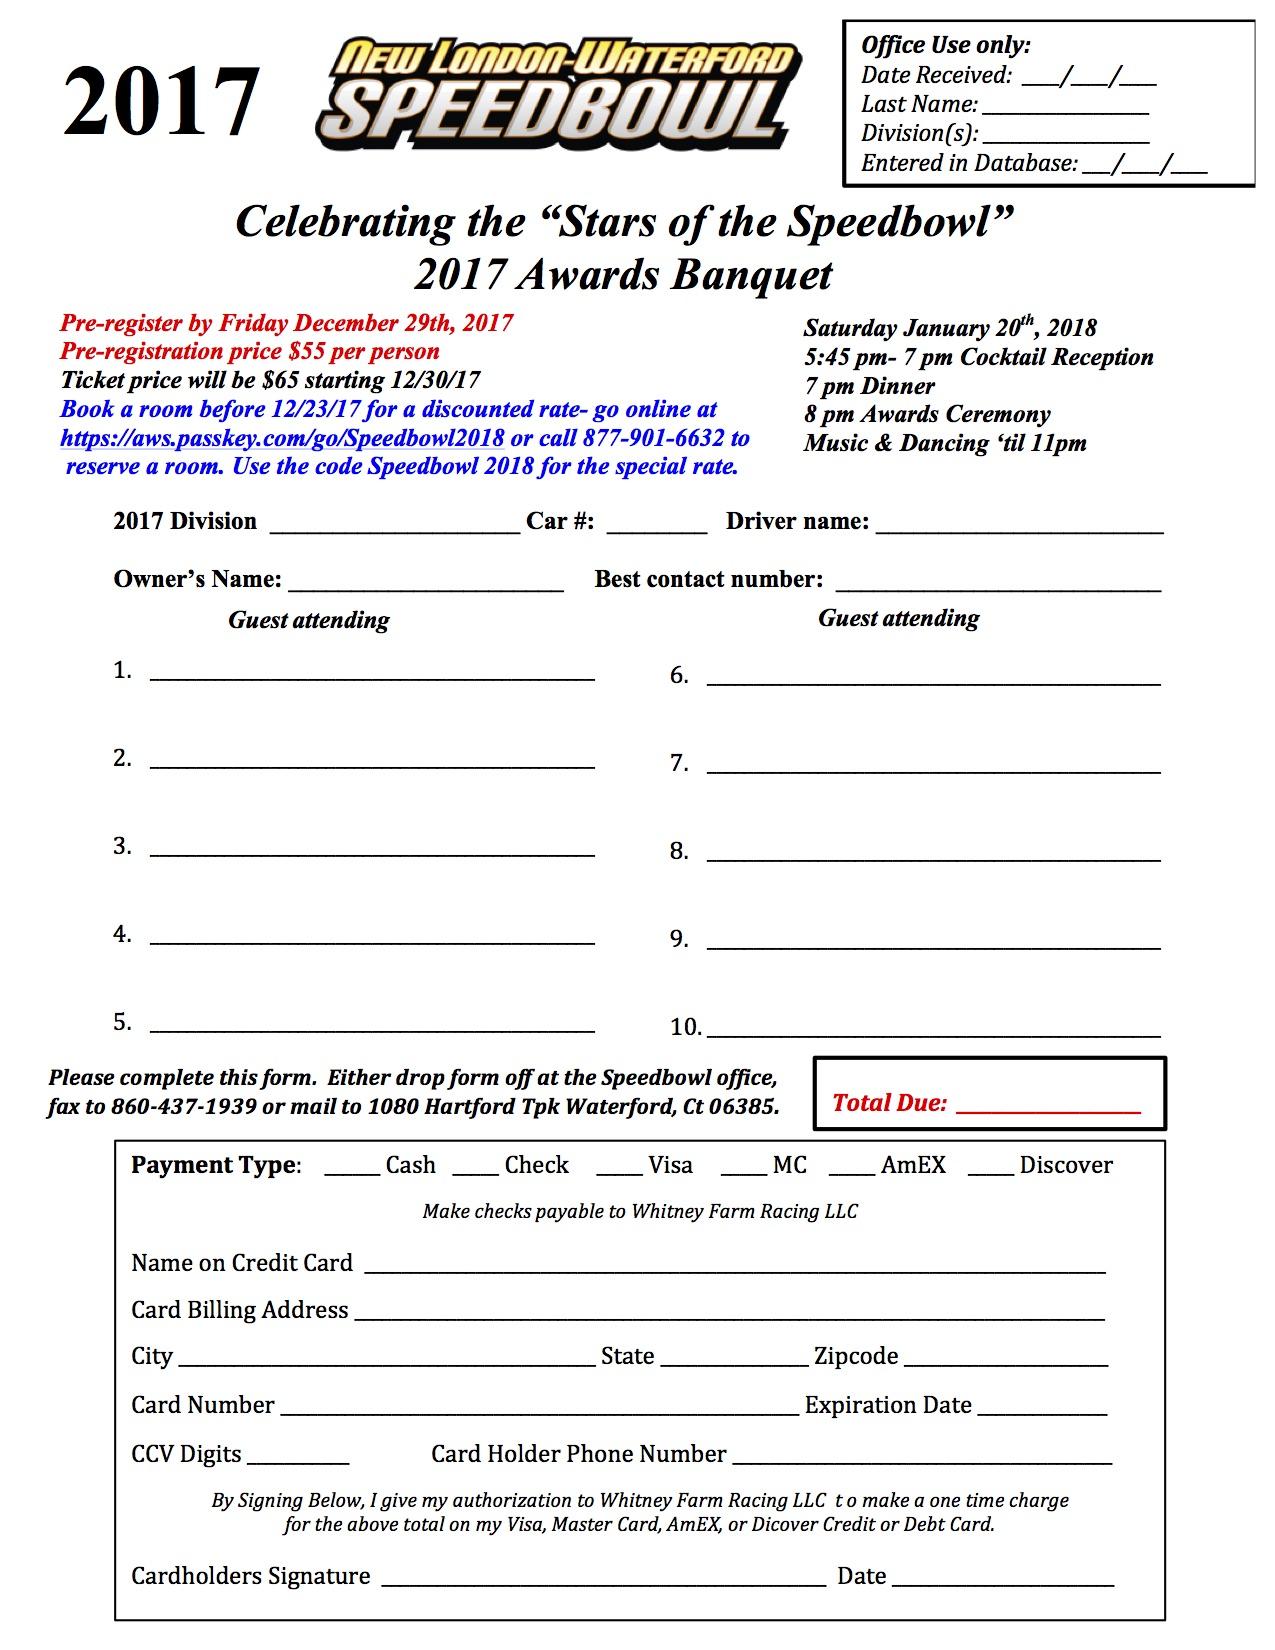 2017 Saturday Night Banquet Form